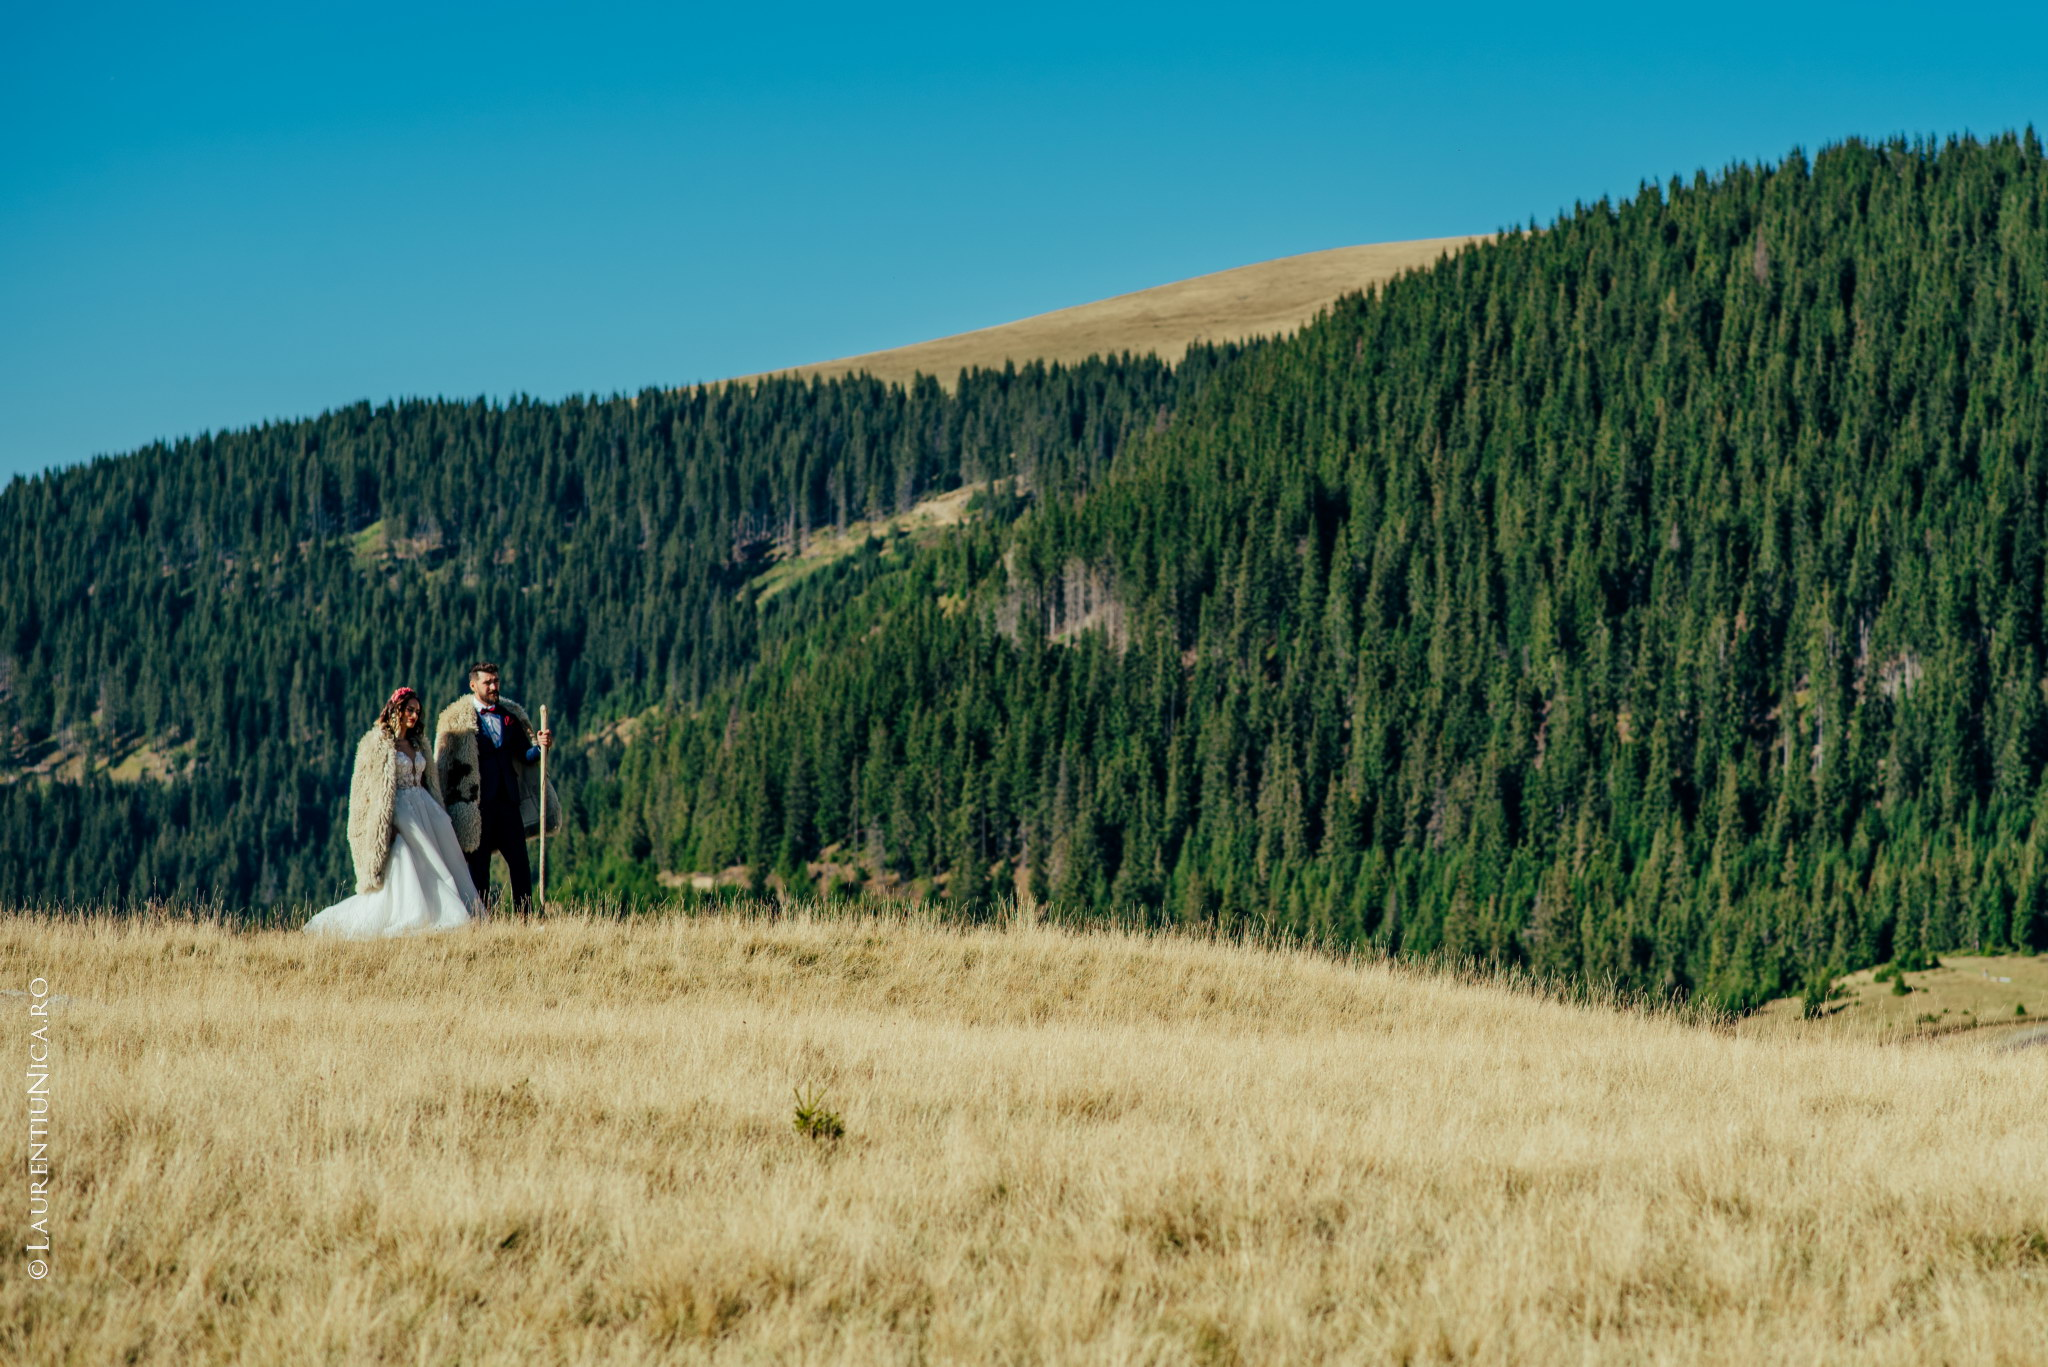 aida si alin fotograf nunta laurentiu nica transalpina 05 - Aida & Alin | Fotografii After Wedding | Transalpina - Muntii Parang